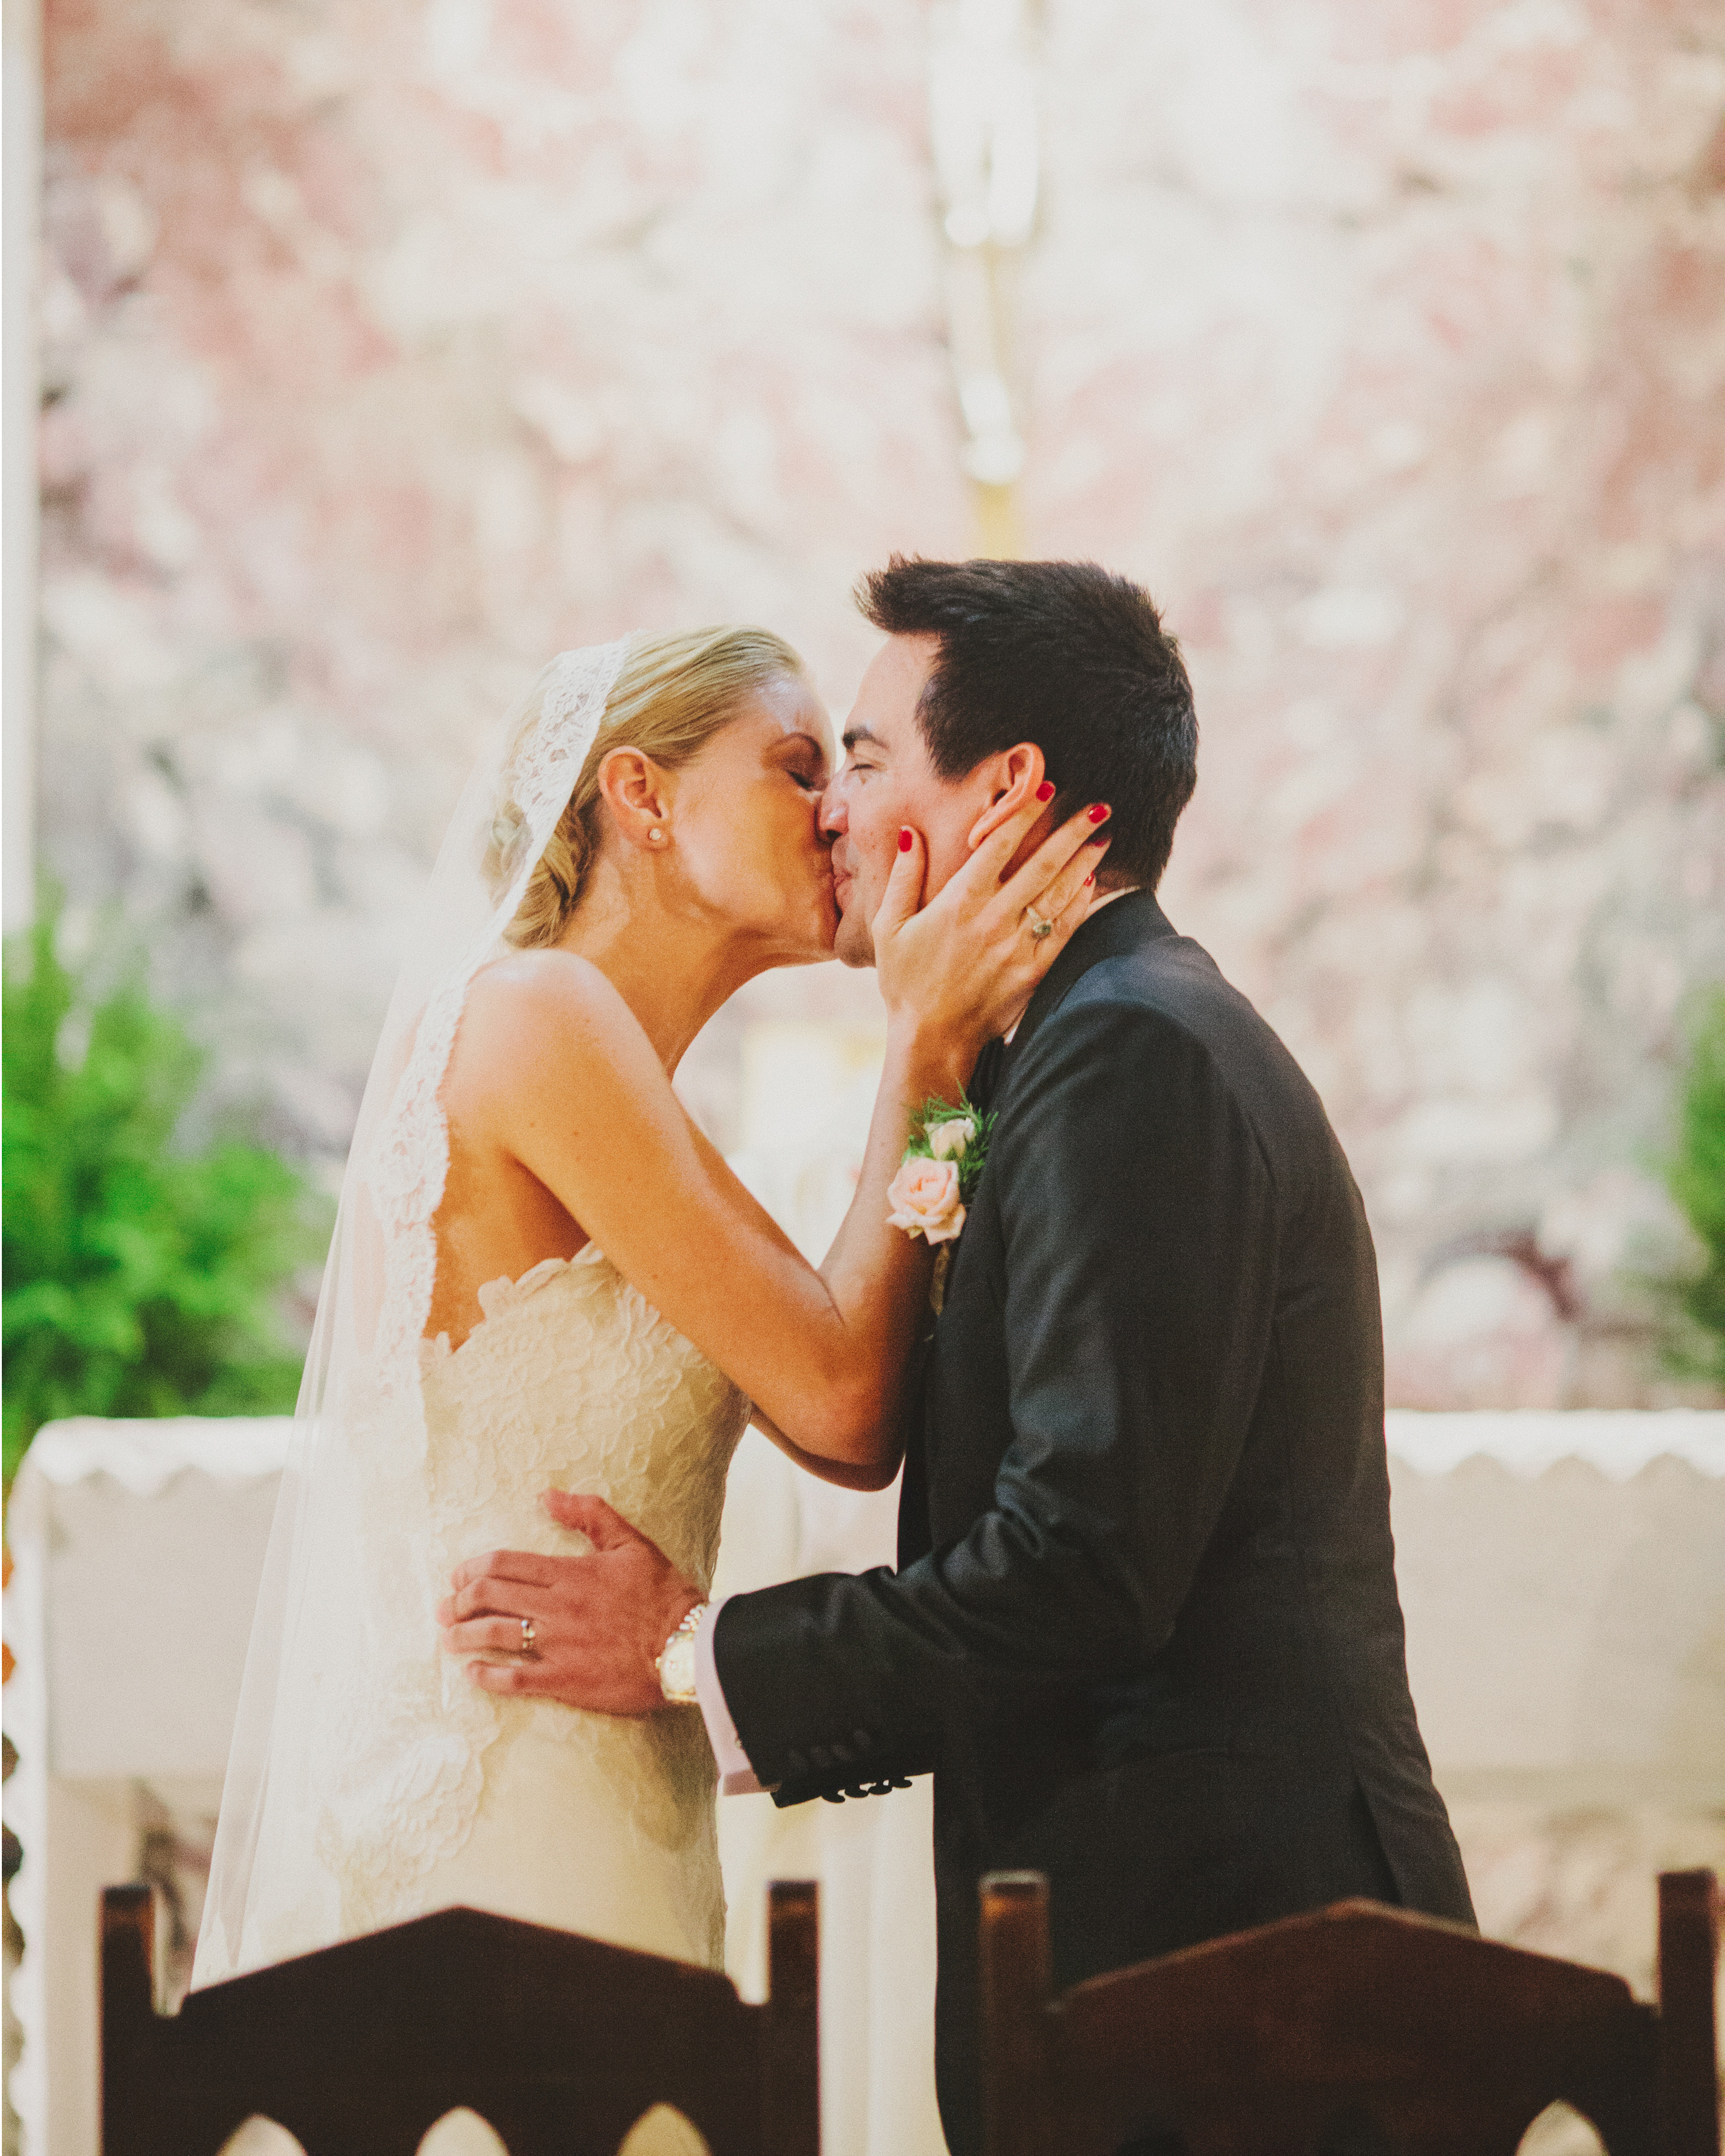 tina-raul-wedding-ceremony3-0314.jpg